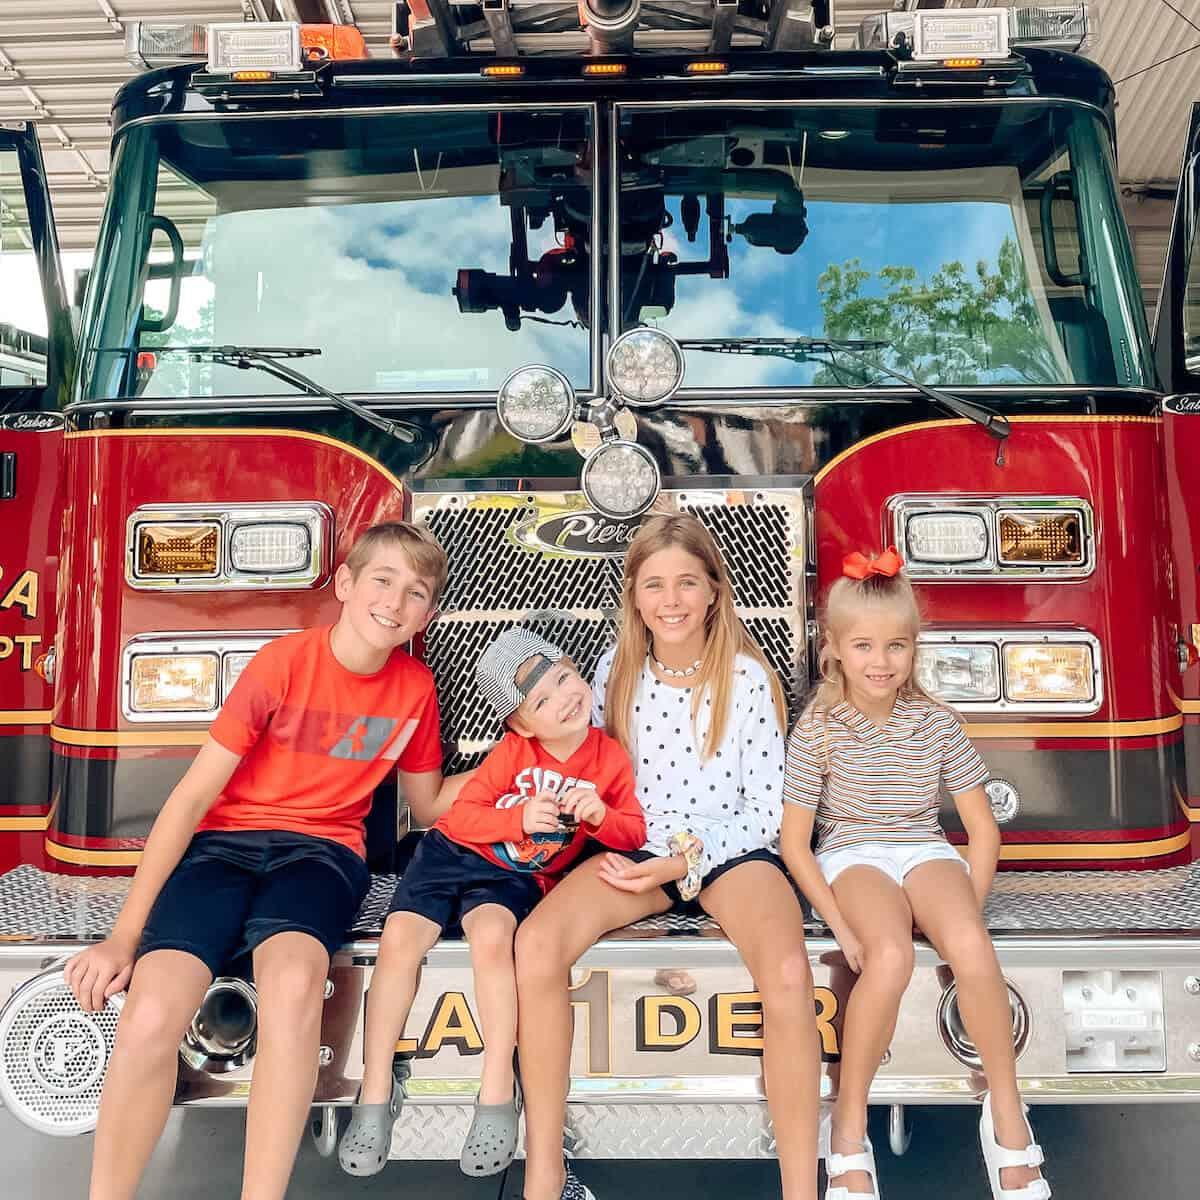 Fire Station Visit 2021